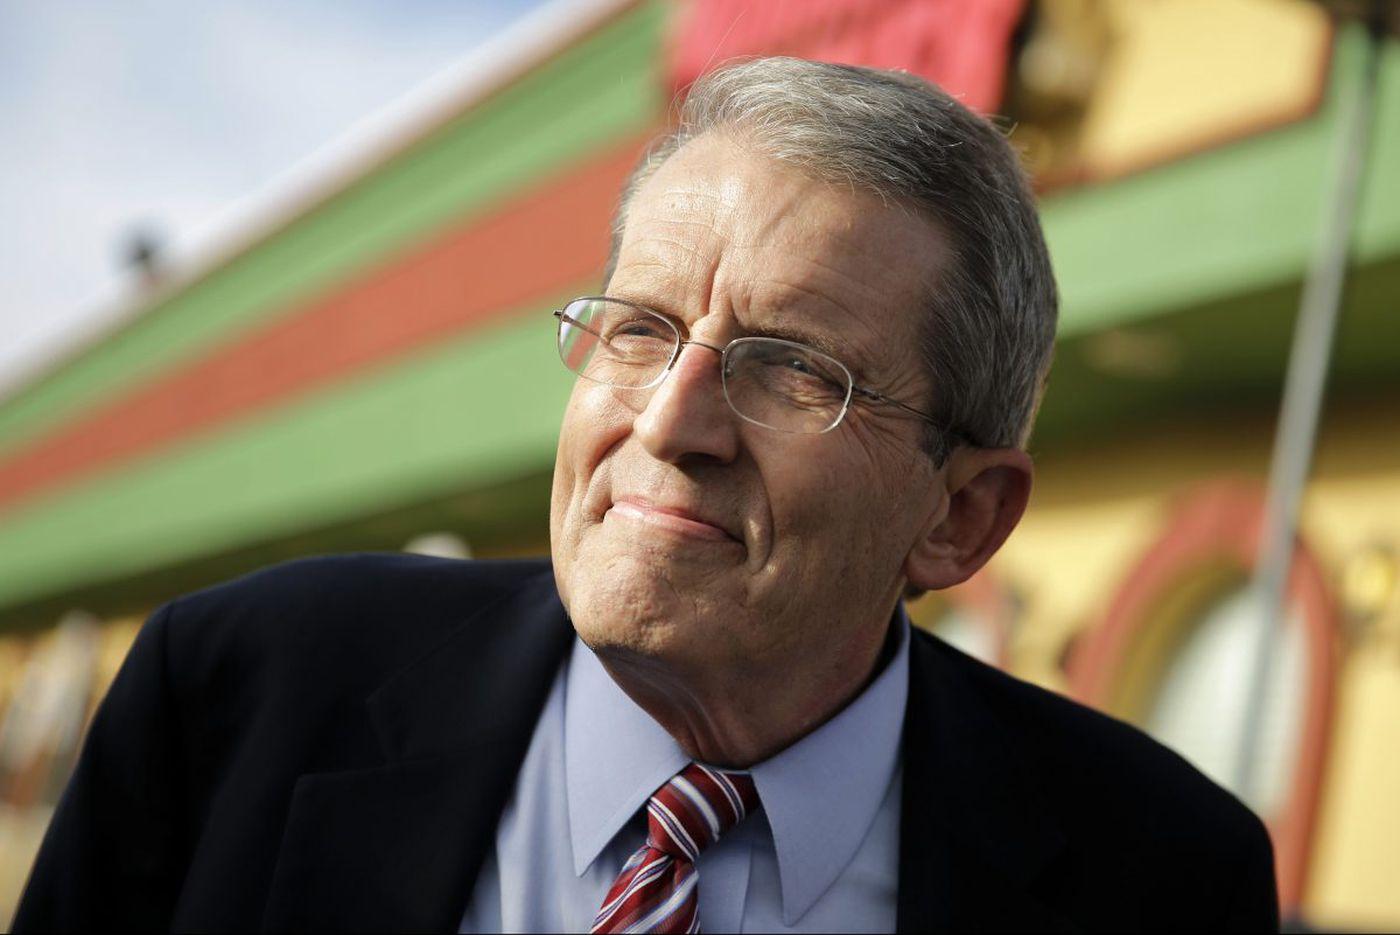 Jeff Bell, three-time U.S. Senate candidate from N.J., dies